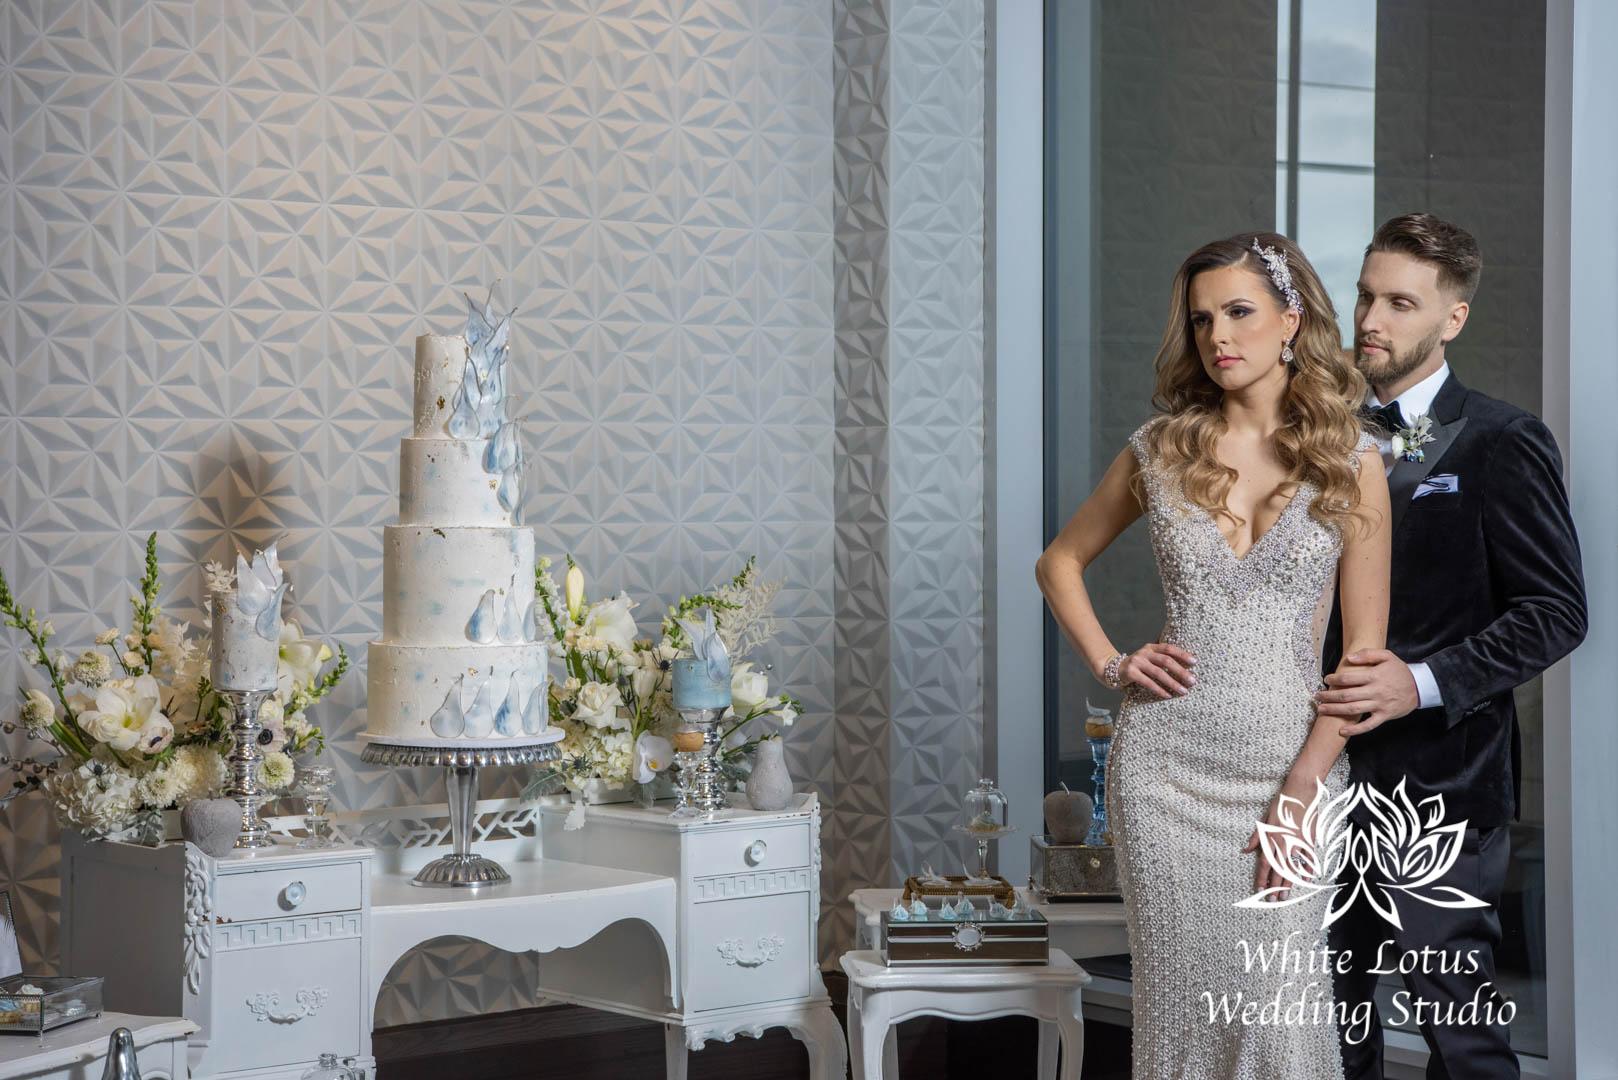 126- GLAM WINTERLUXE WEDDING INSPIRATION